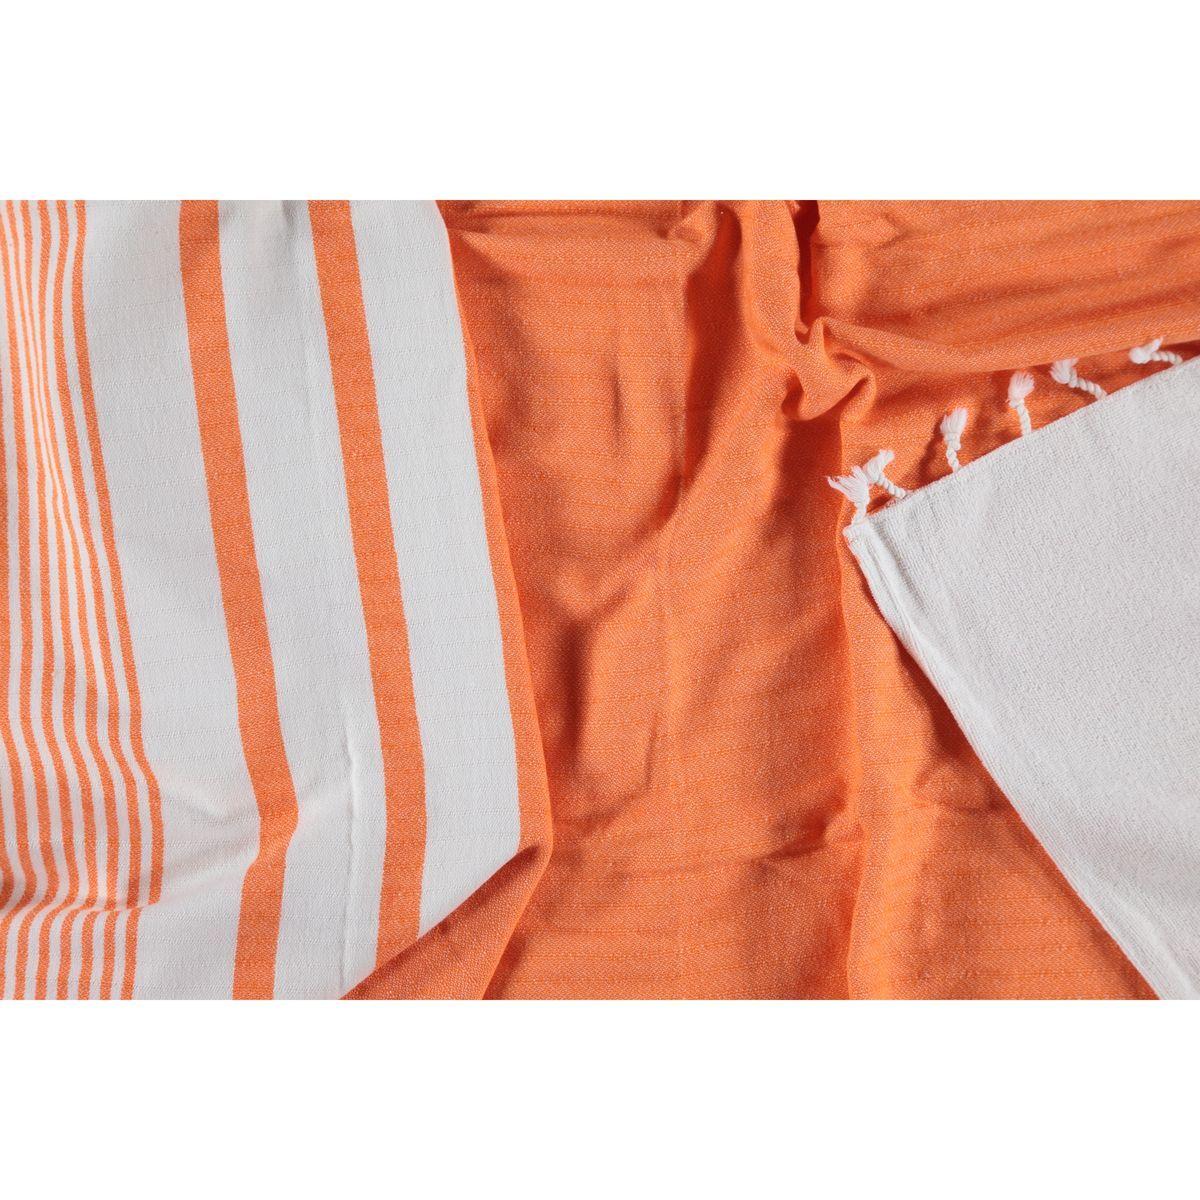 Peshtowel Tabiat - Double Face / Orange